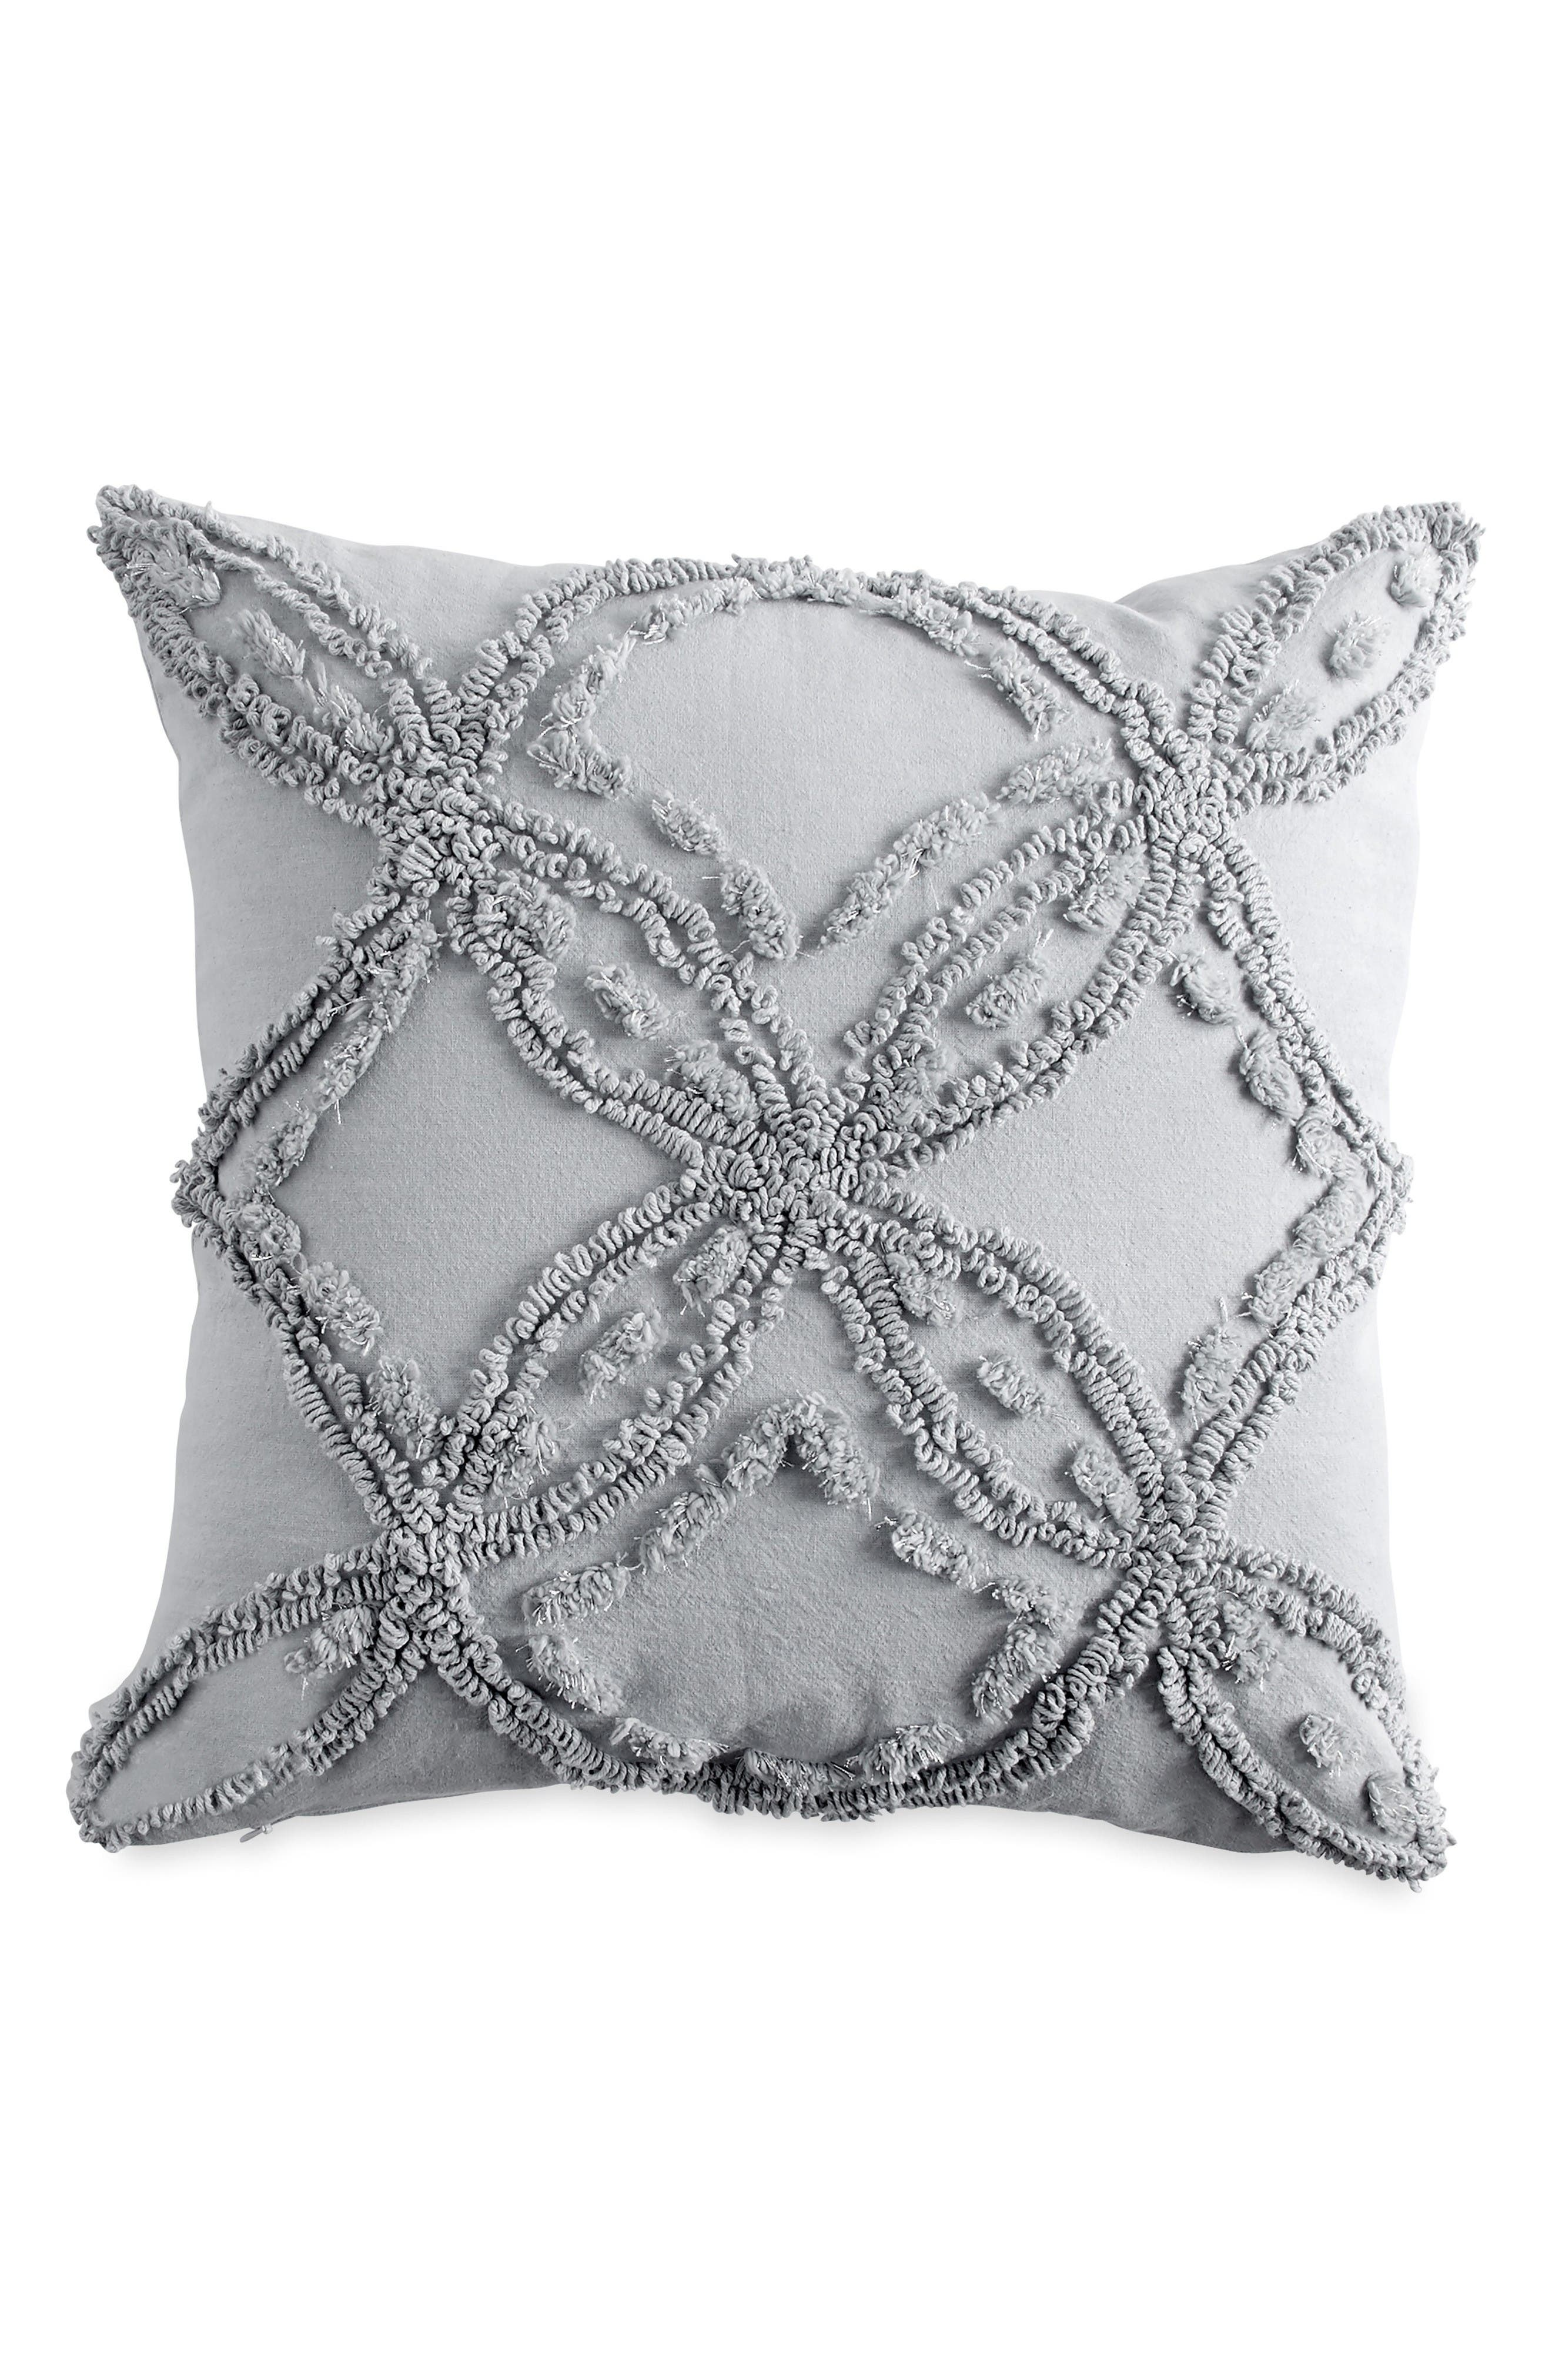 Main Image - Peri Home Chenille Pillow